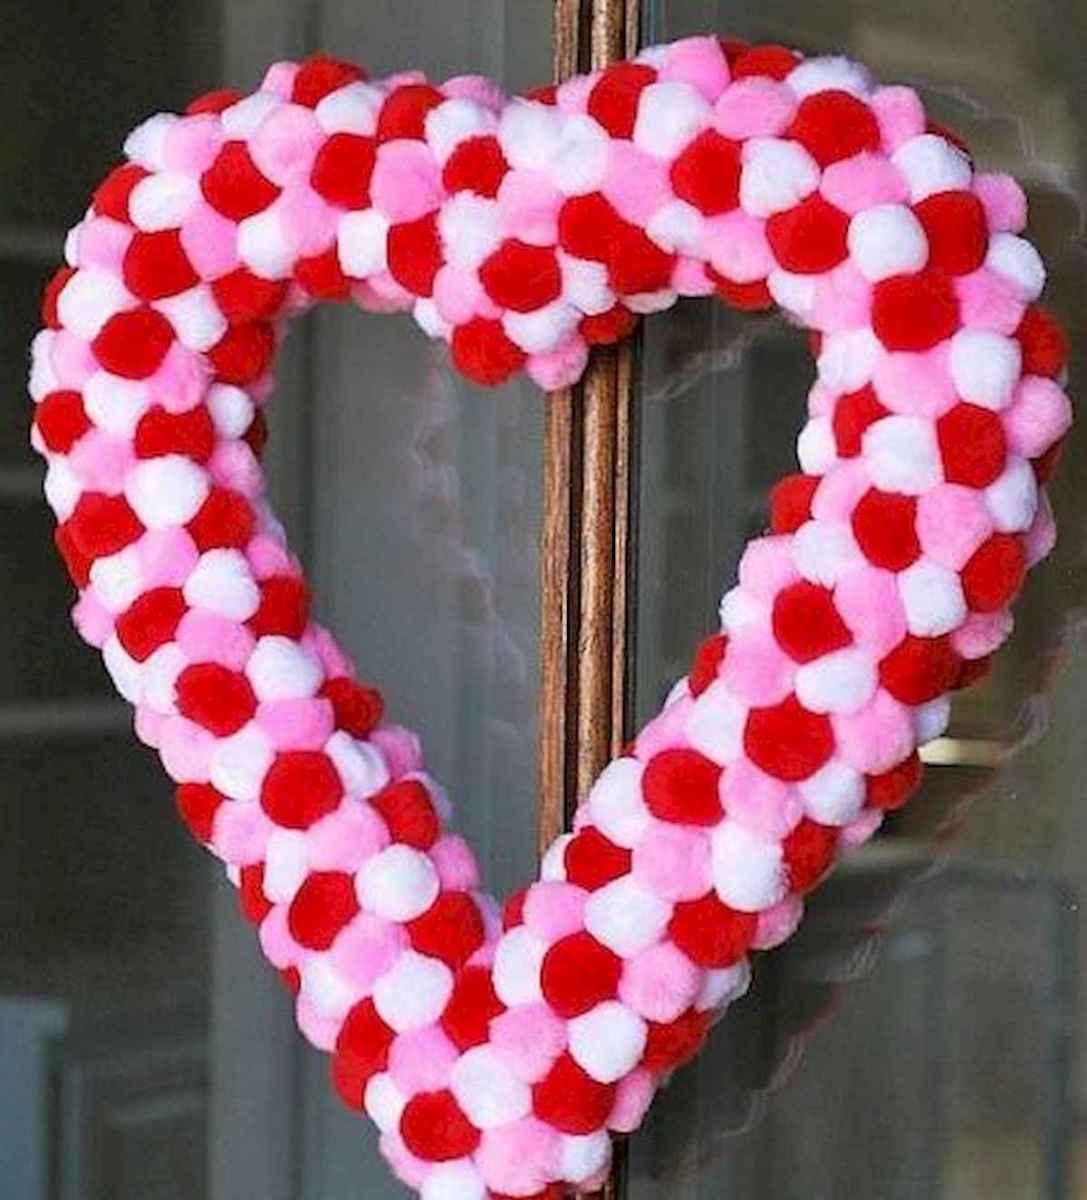 75 Romantic Valentines Day Crafts Design Ideas (62)